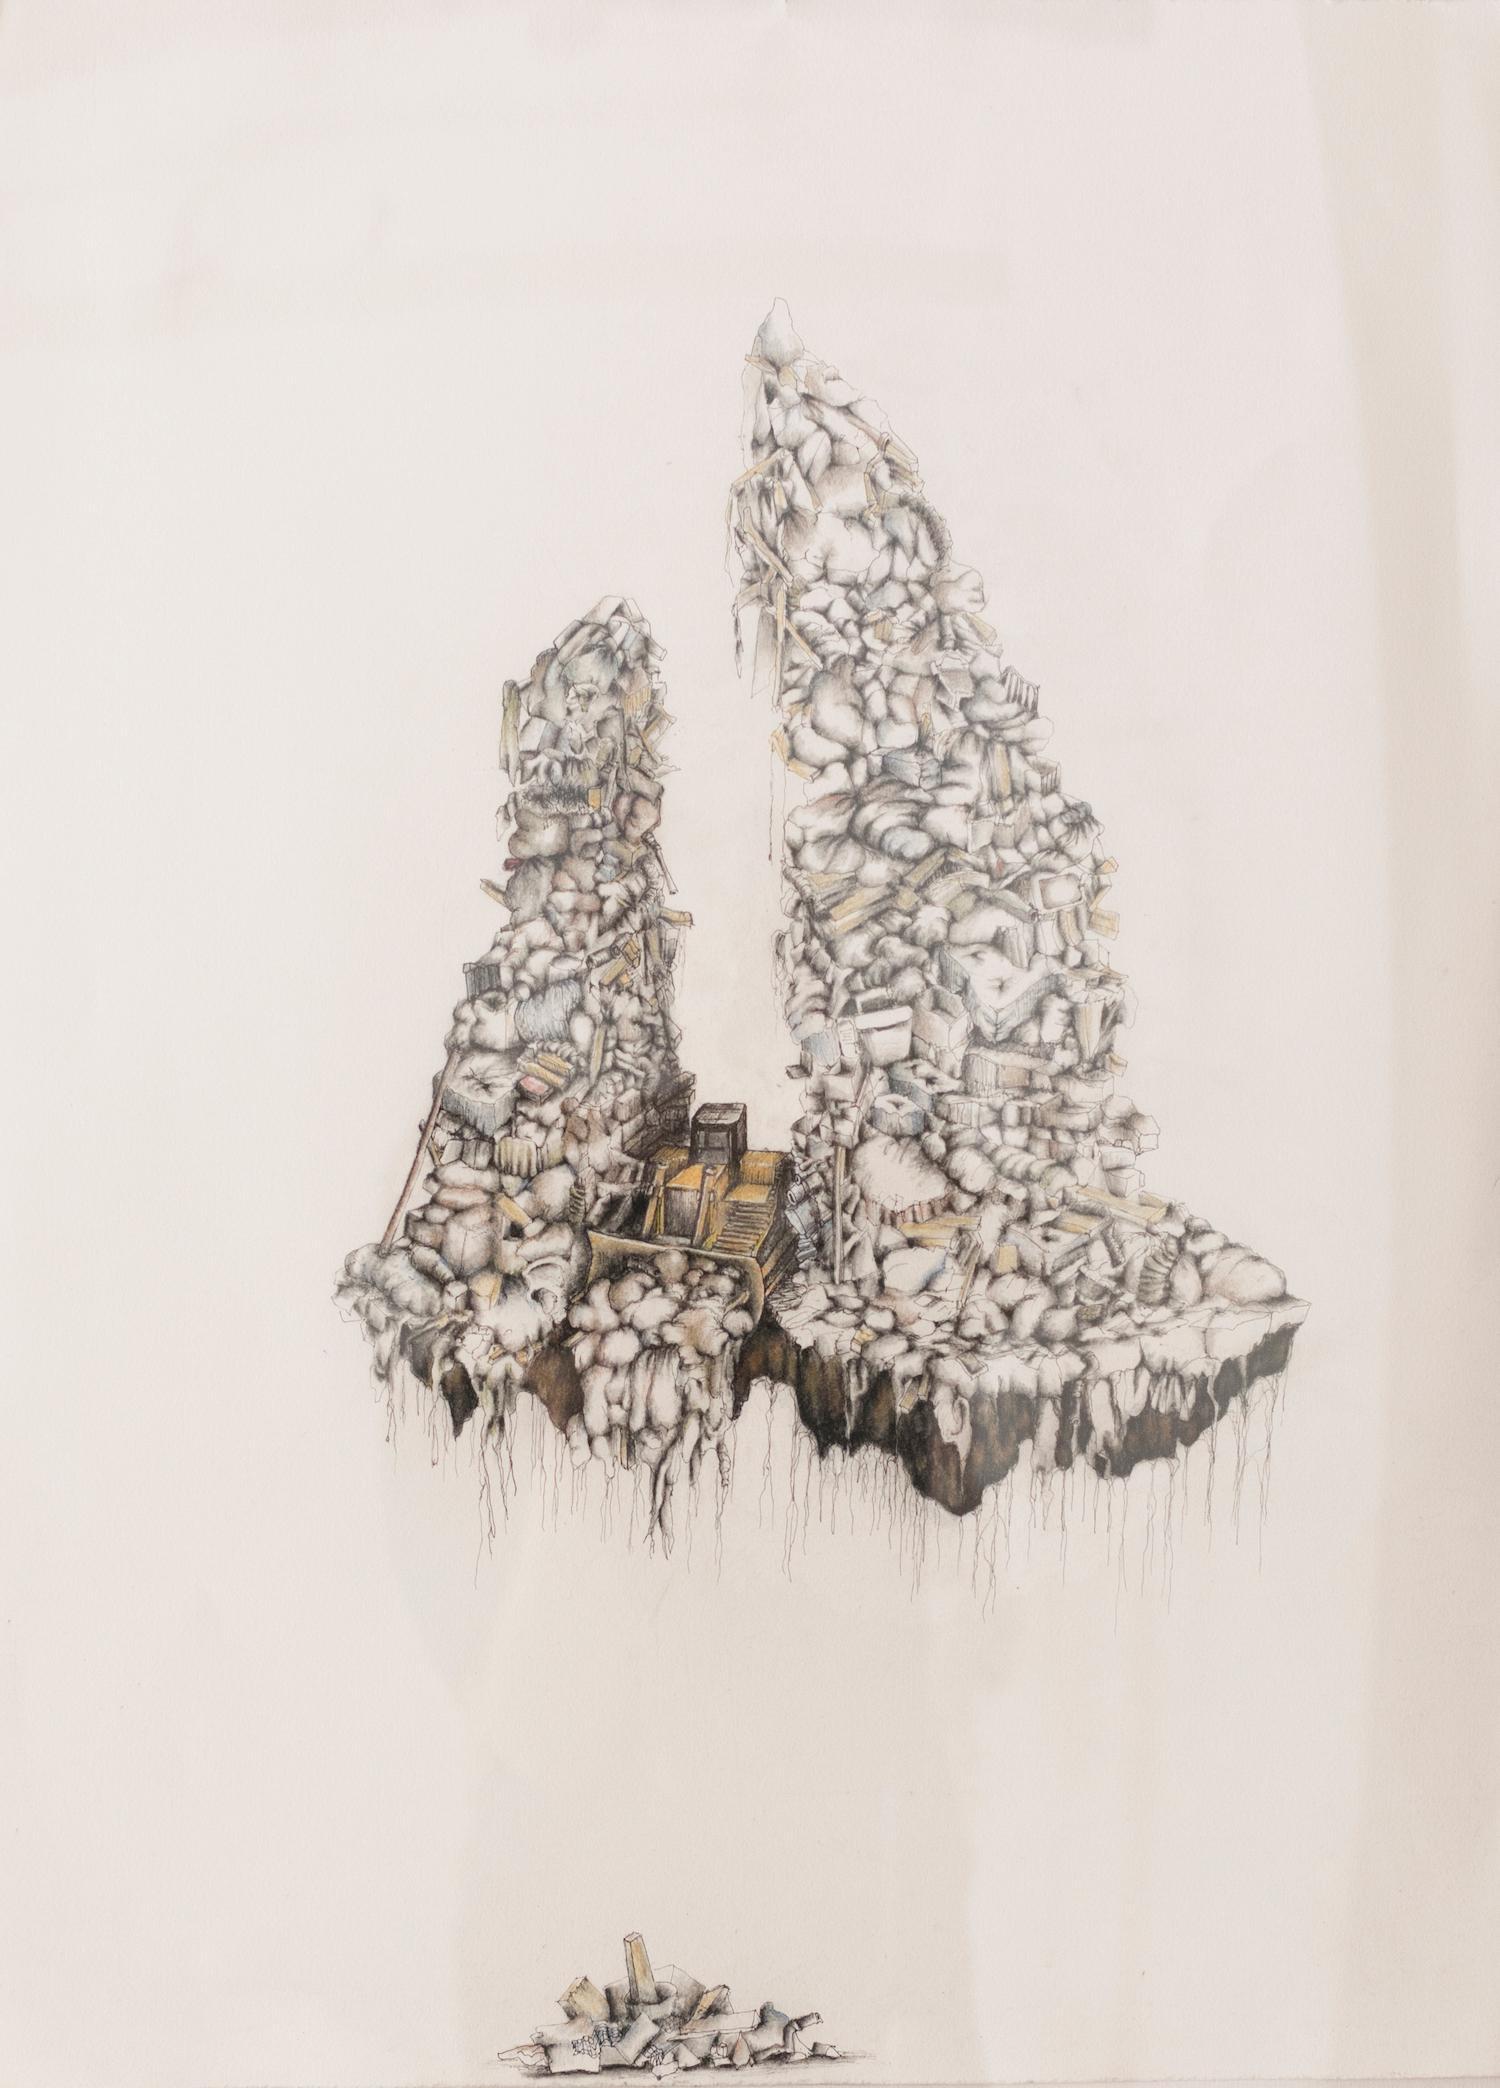 """Evidence of Human Habitation"", mixed media, drawing, ink, charcoal, bulldozer"